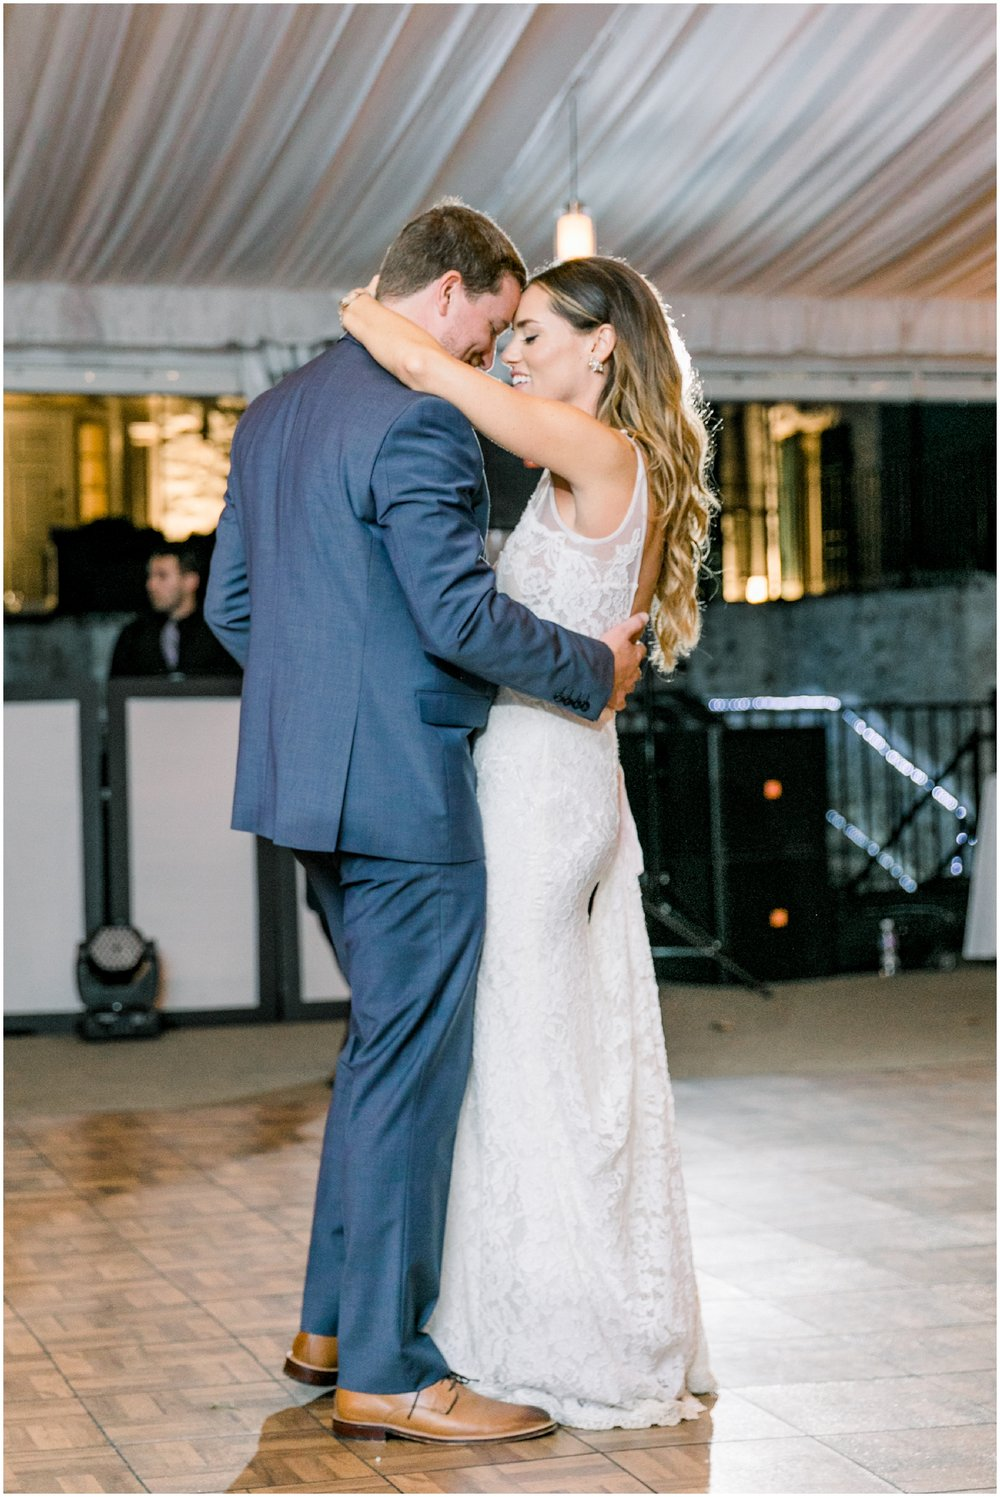 Summer Wedding at Philander Chase Knox Estate in Malvern, PA - Krista Brackin Photography_0167.jpg